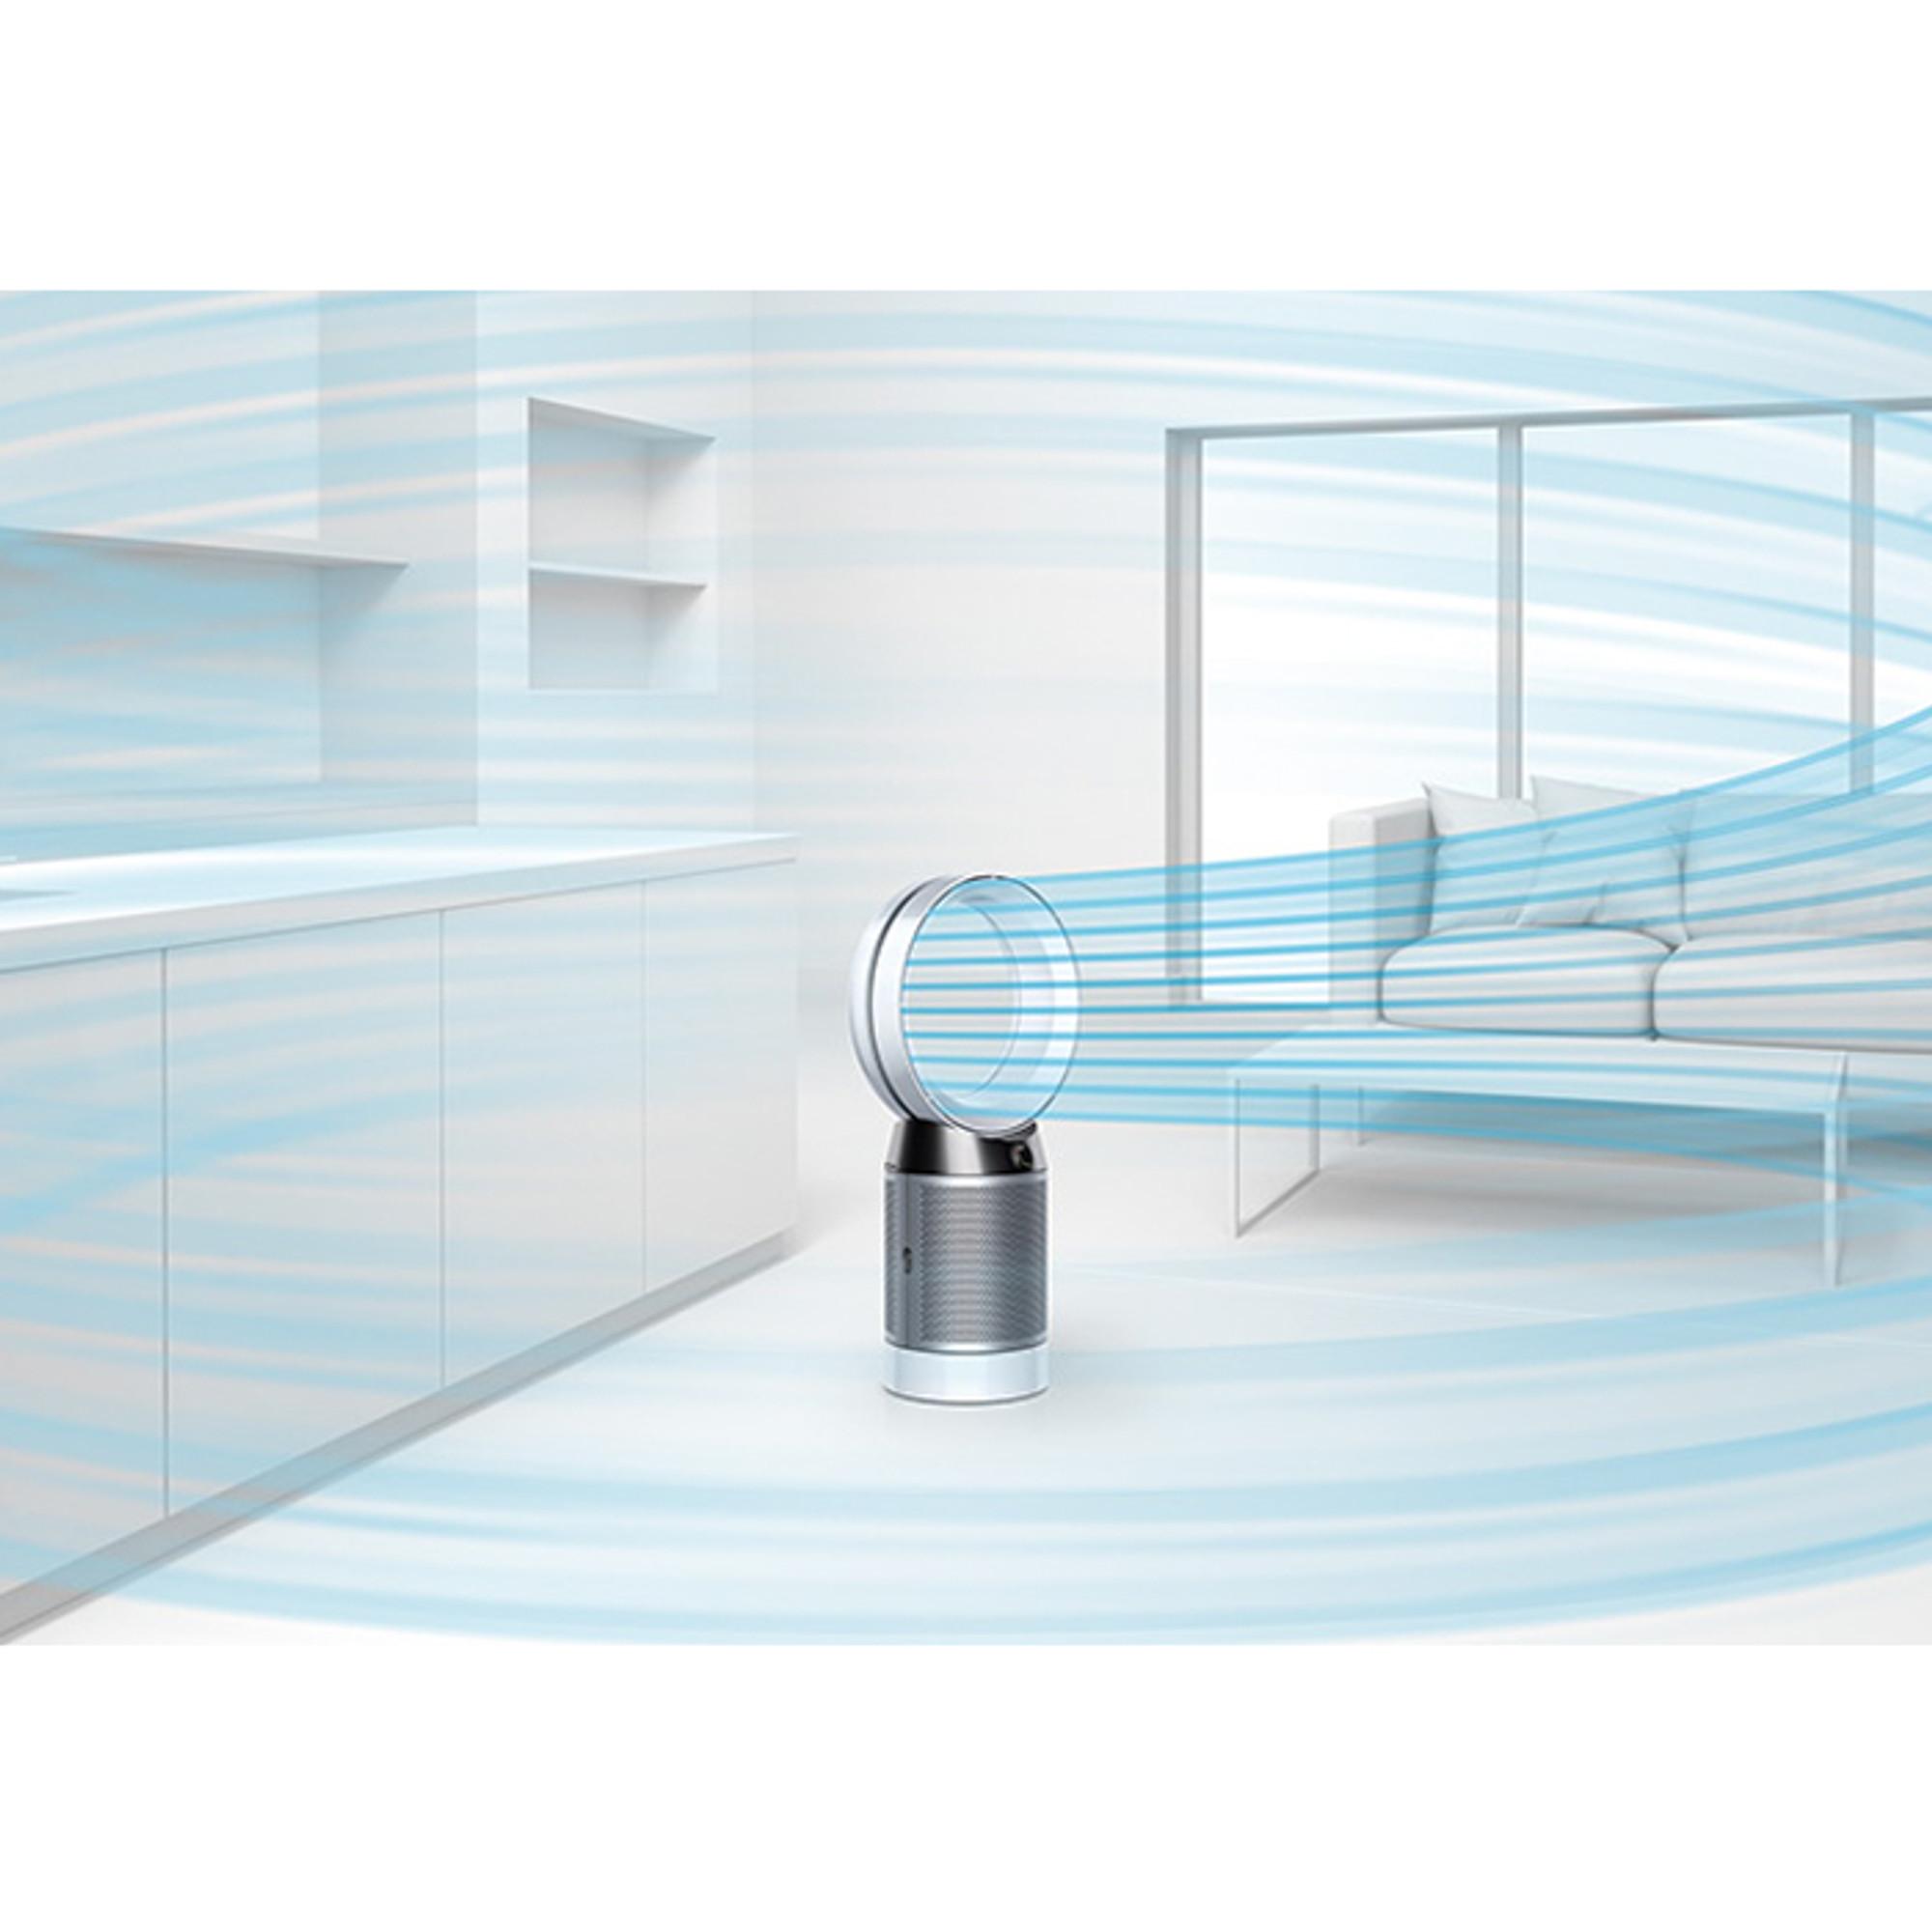 Surprising Dyson Pure Cool Desk Air Purifier And Fan Download Free Architecture Designs Embacsunscenecom